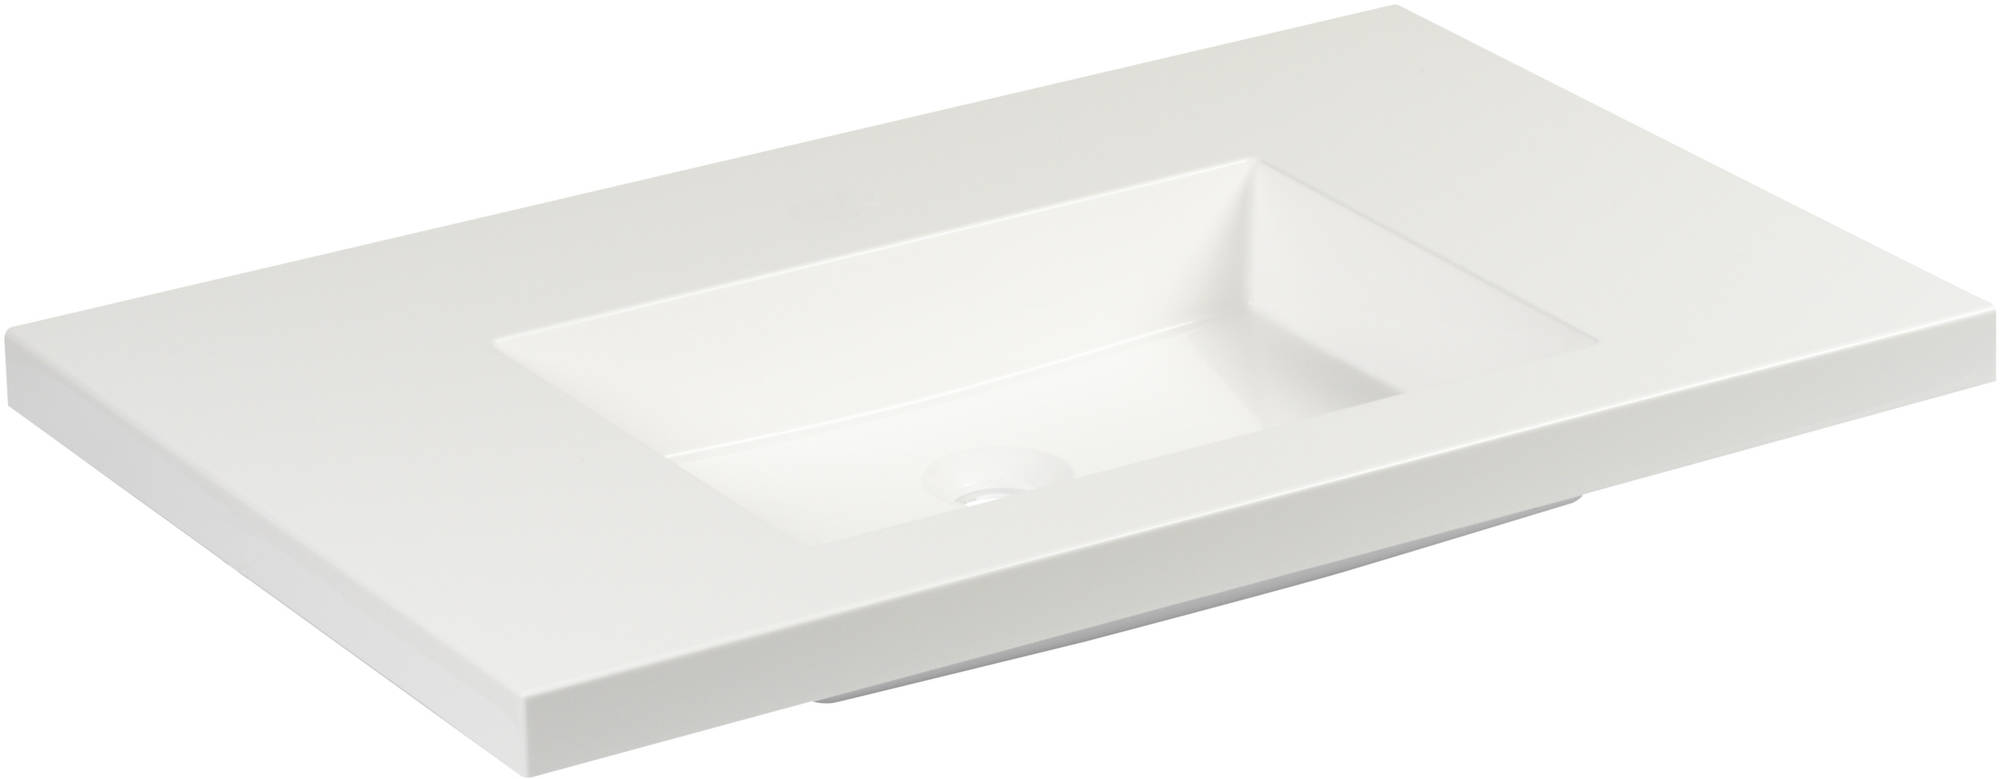 Ben Straight Wastafel zonder kraangat 80x51 cm Wit